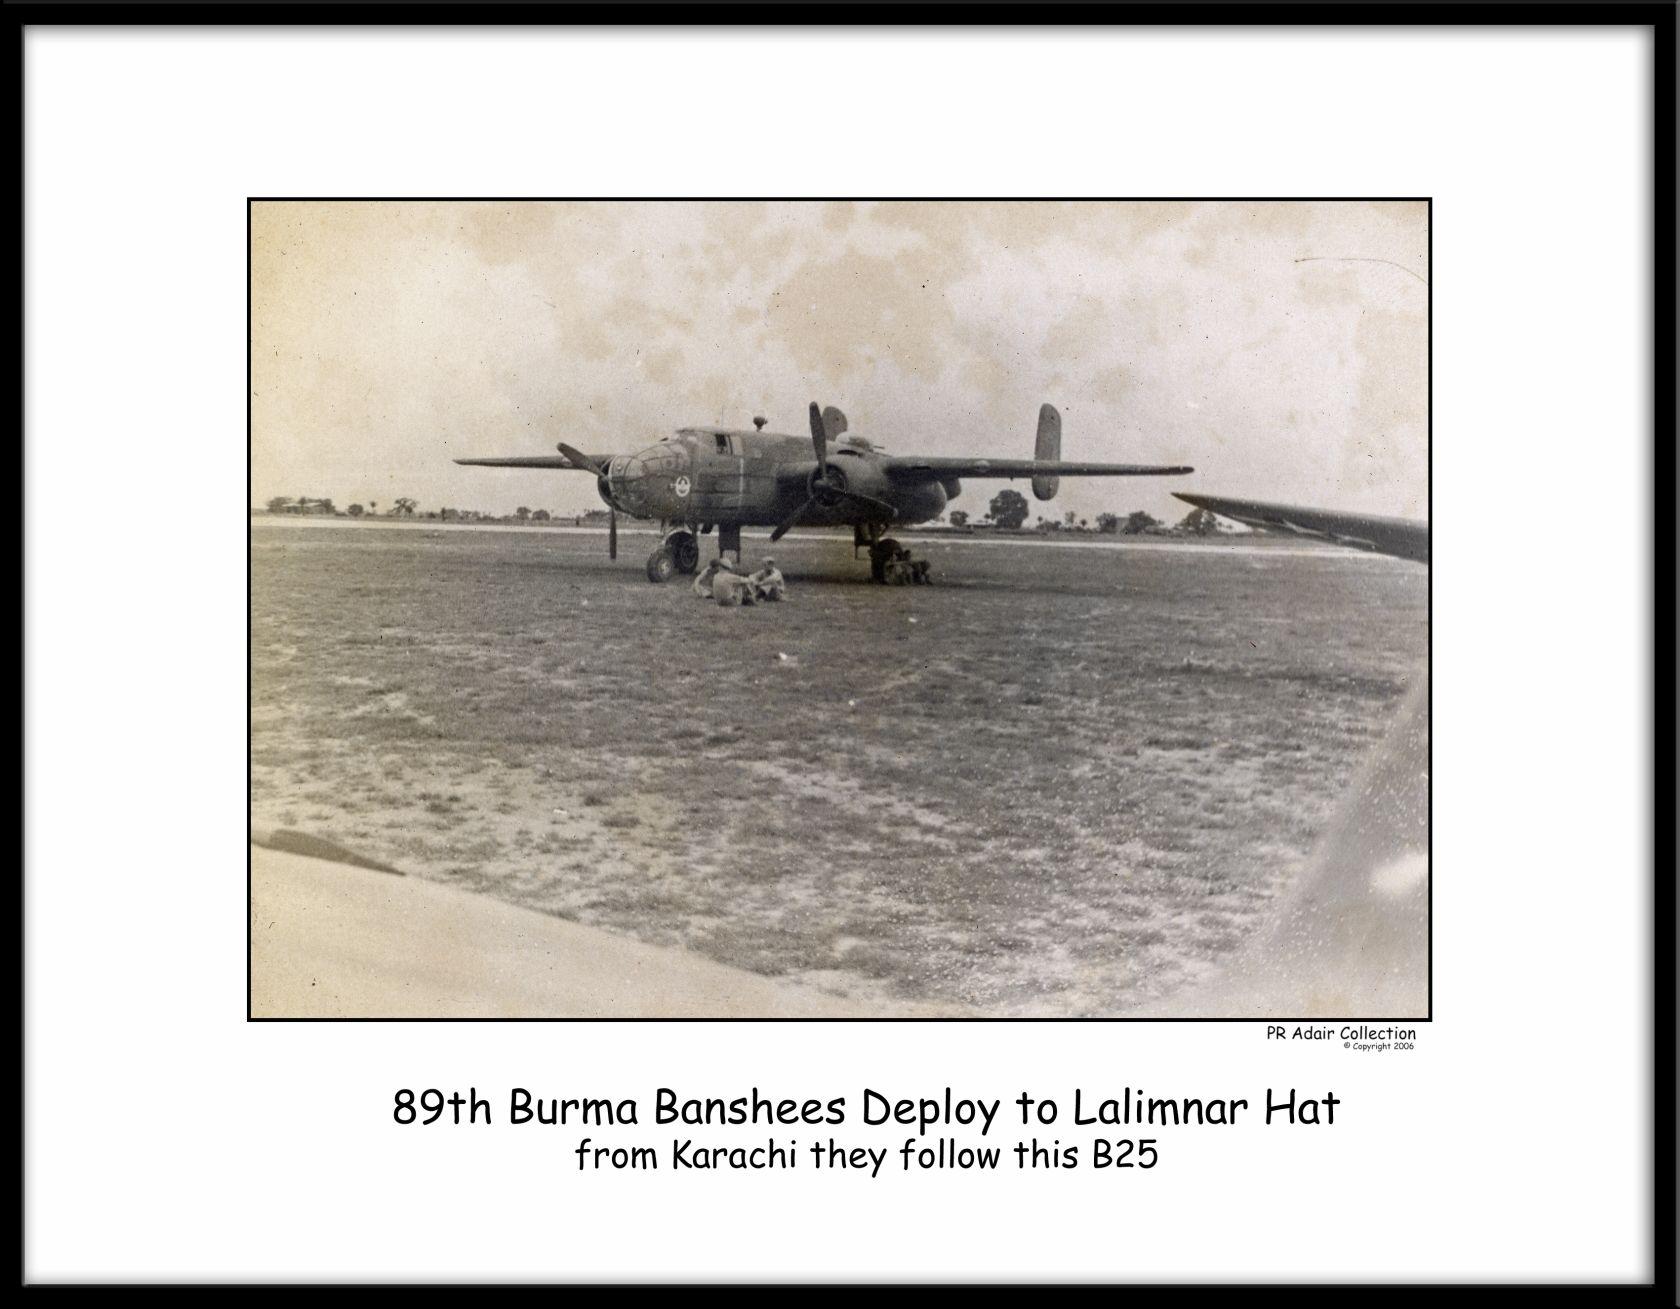 Burma Banshee 175